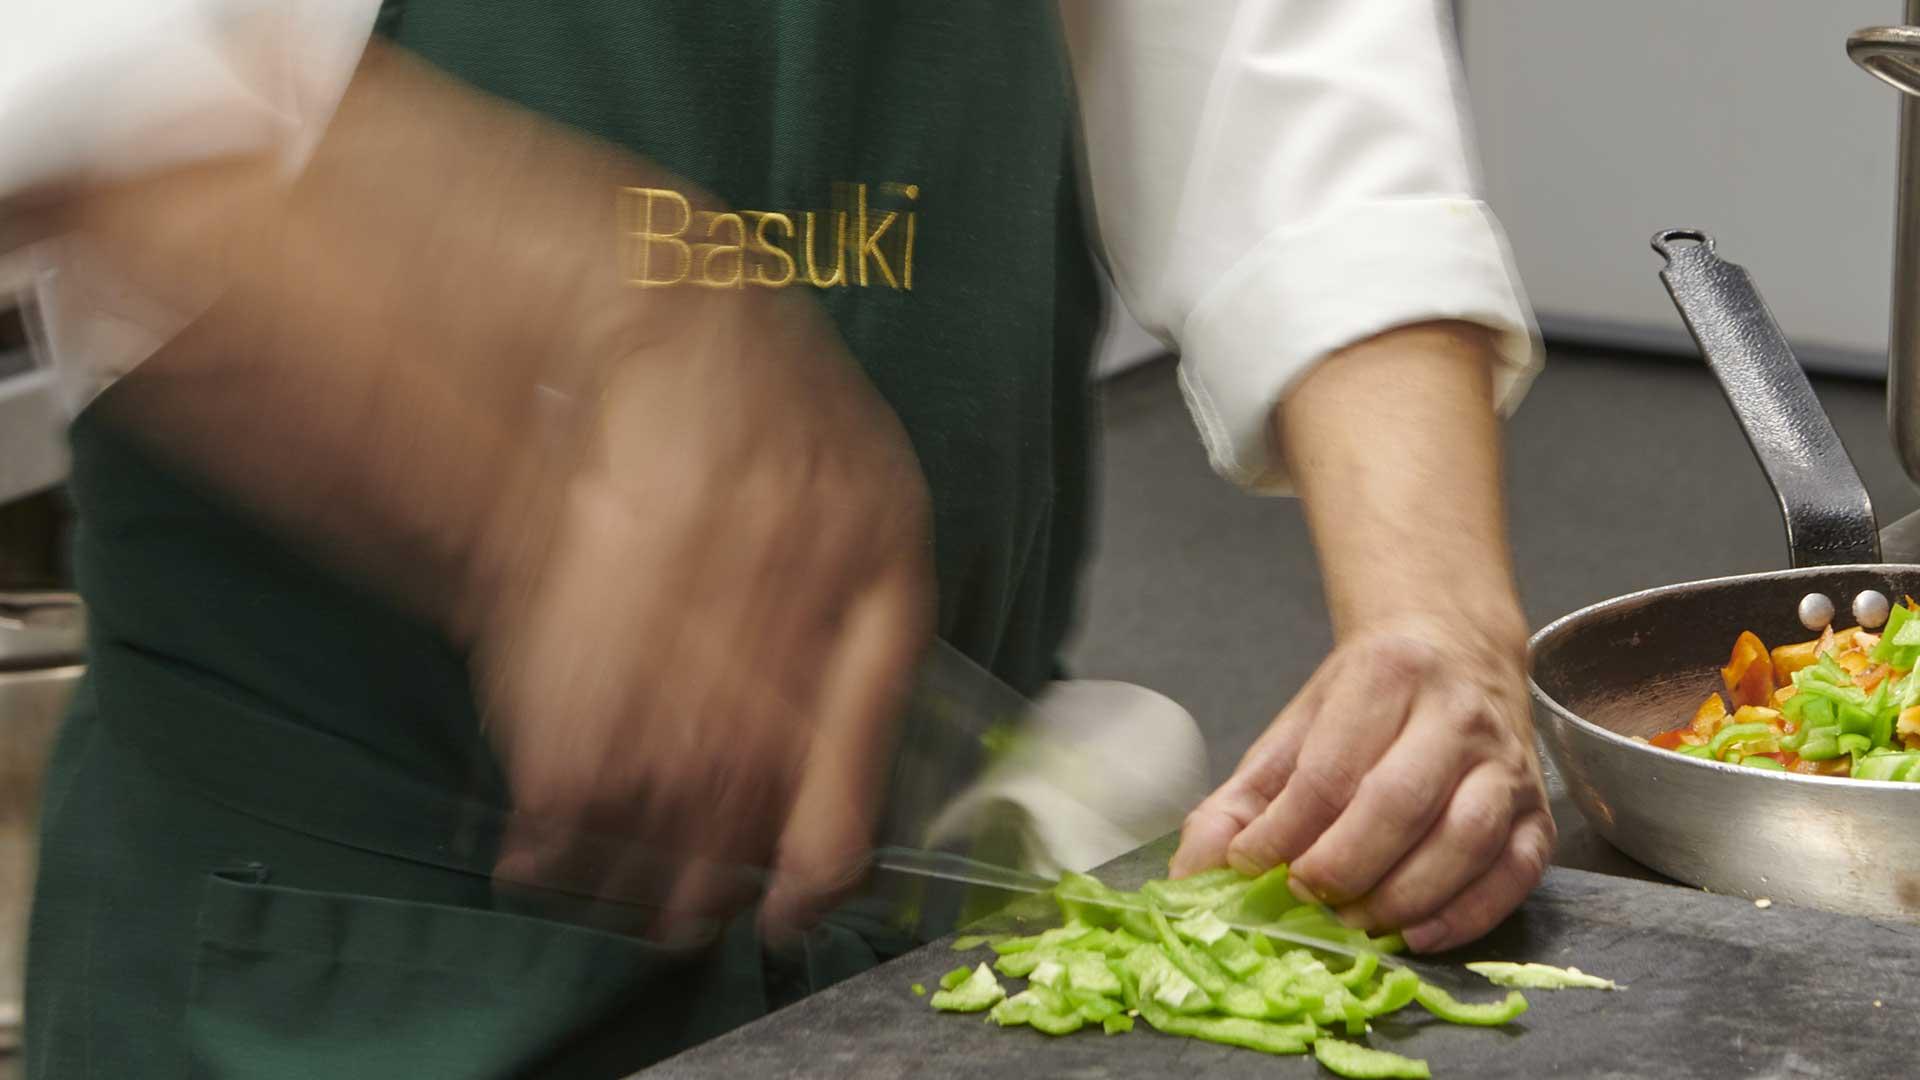 imagen de basuki 2